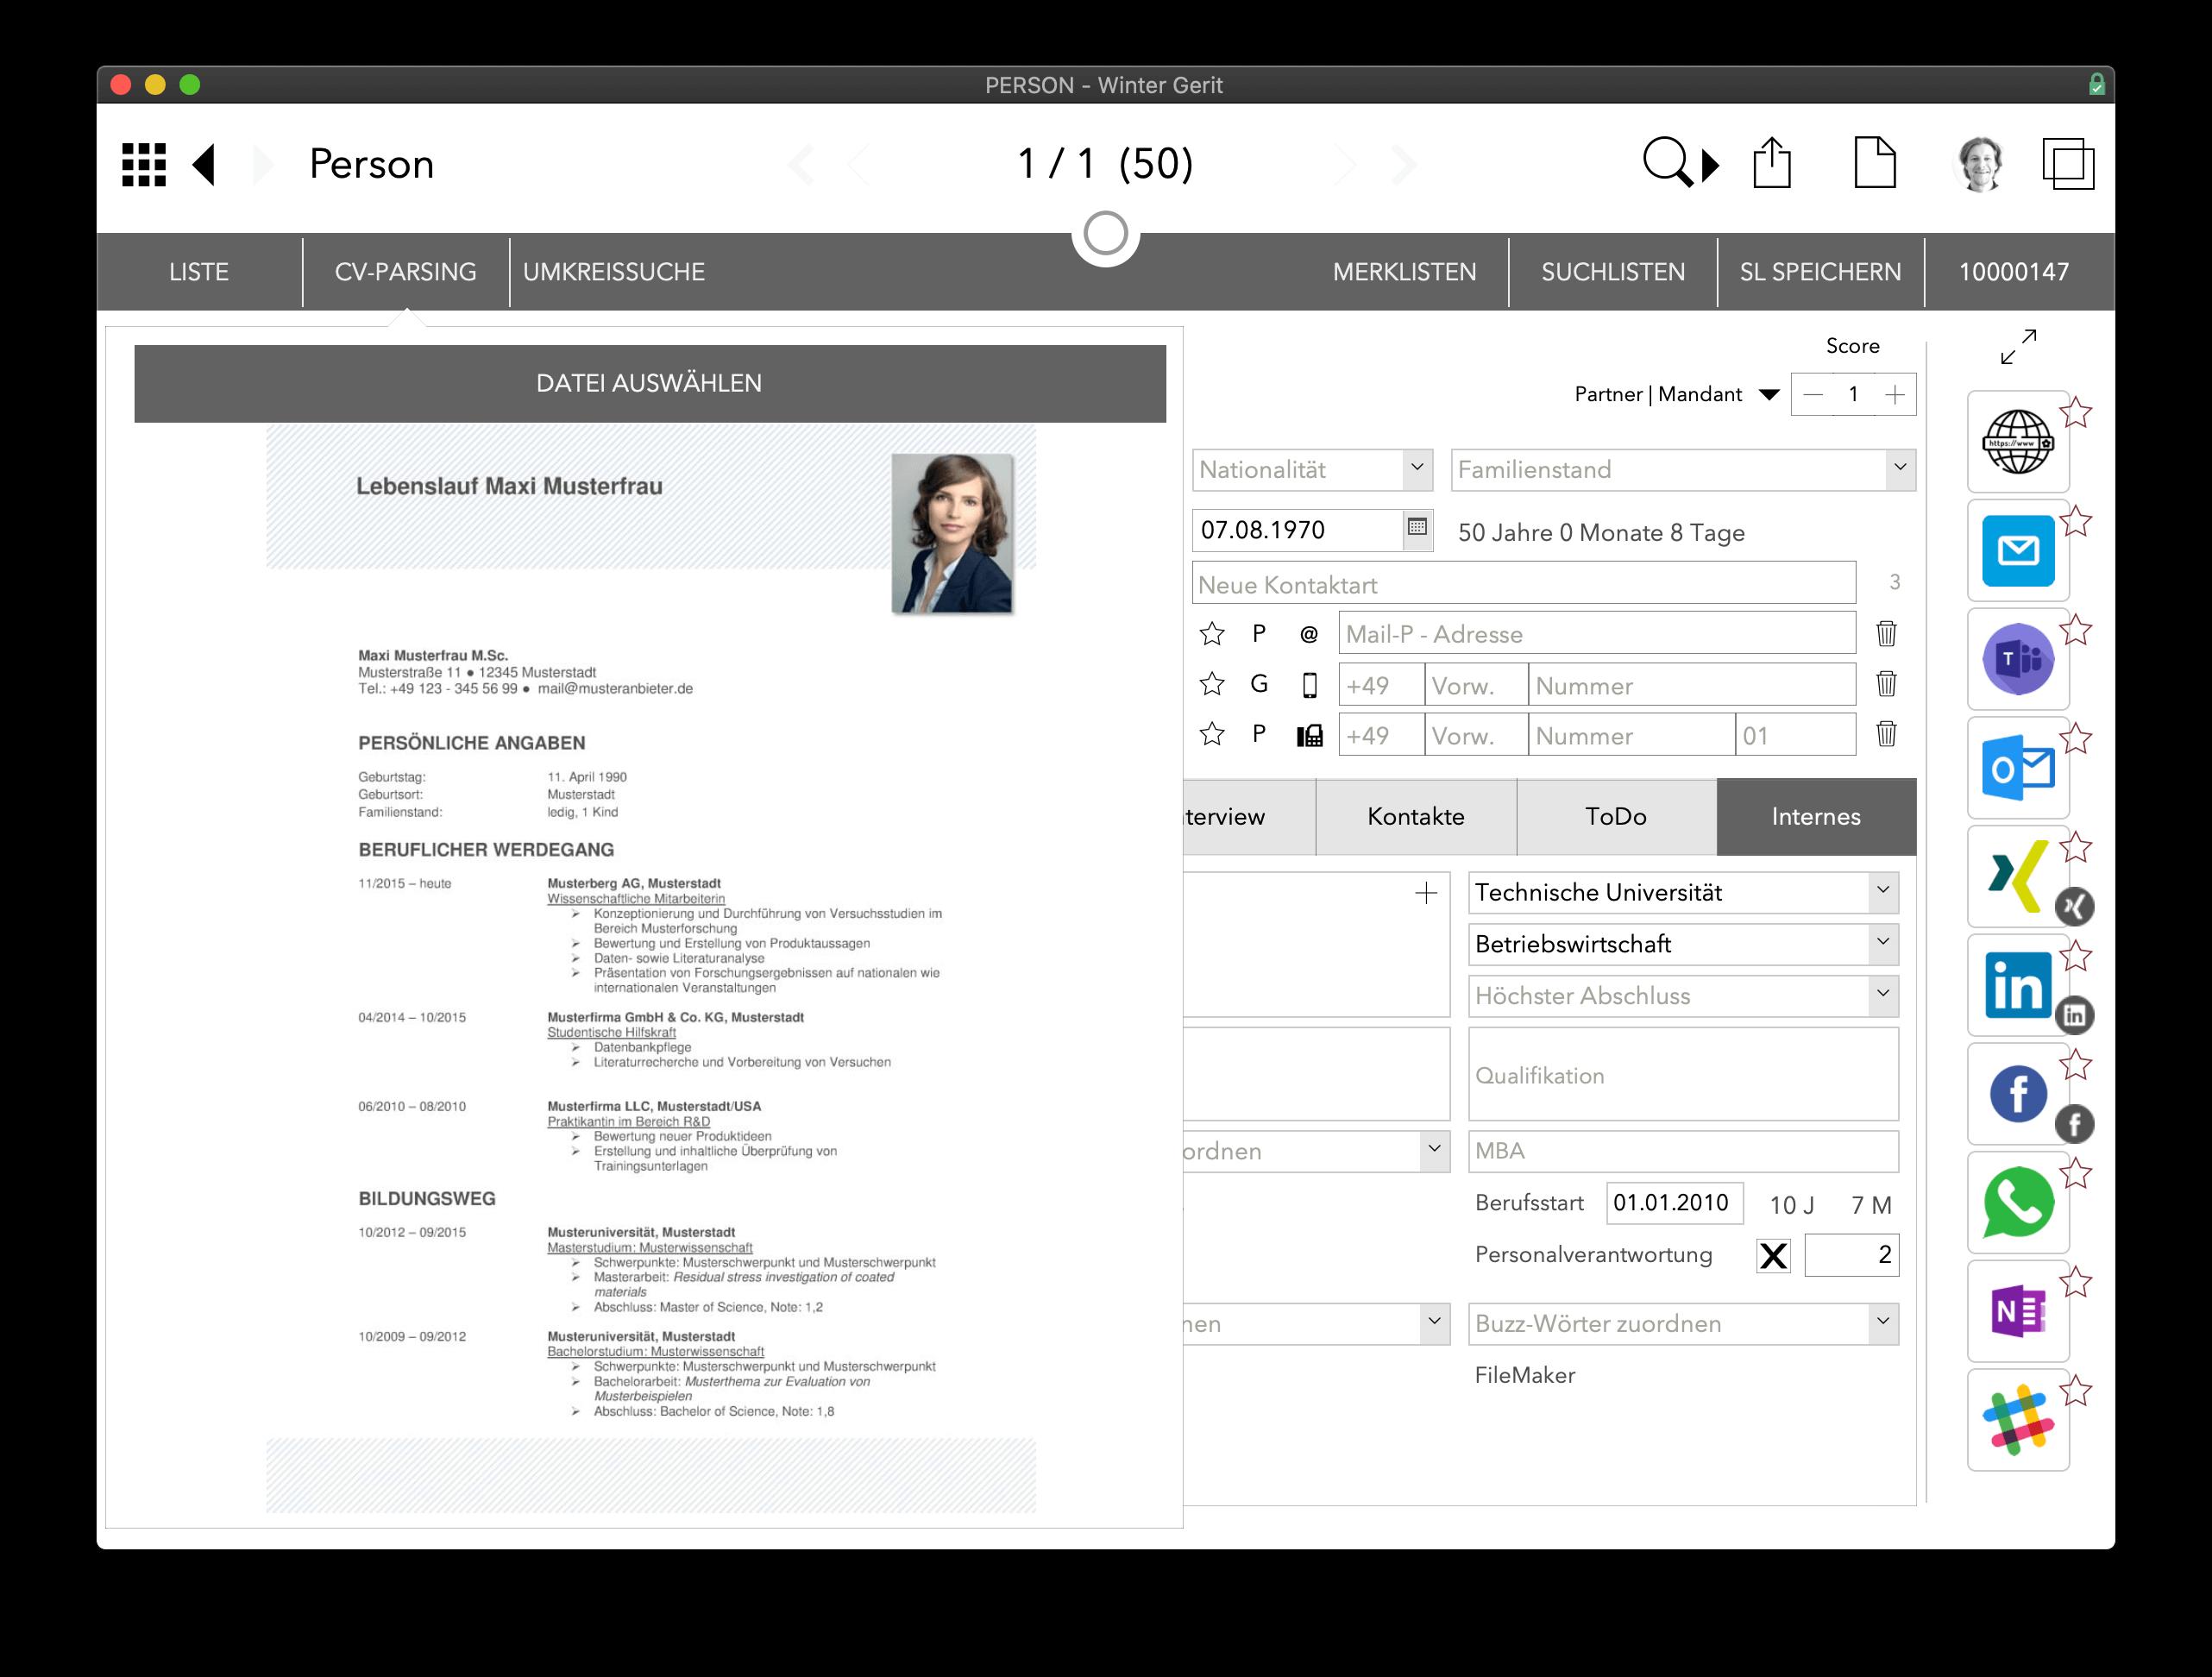 iRO - intelligent Recruiting Office